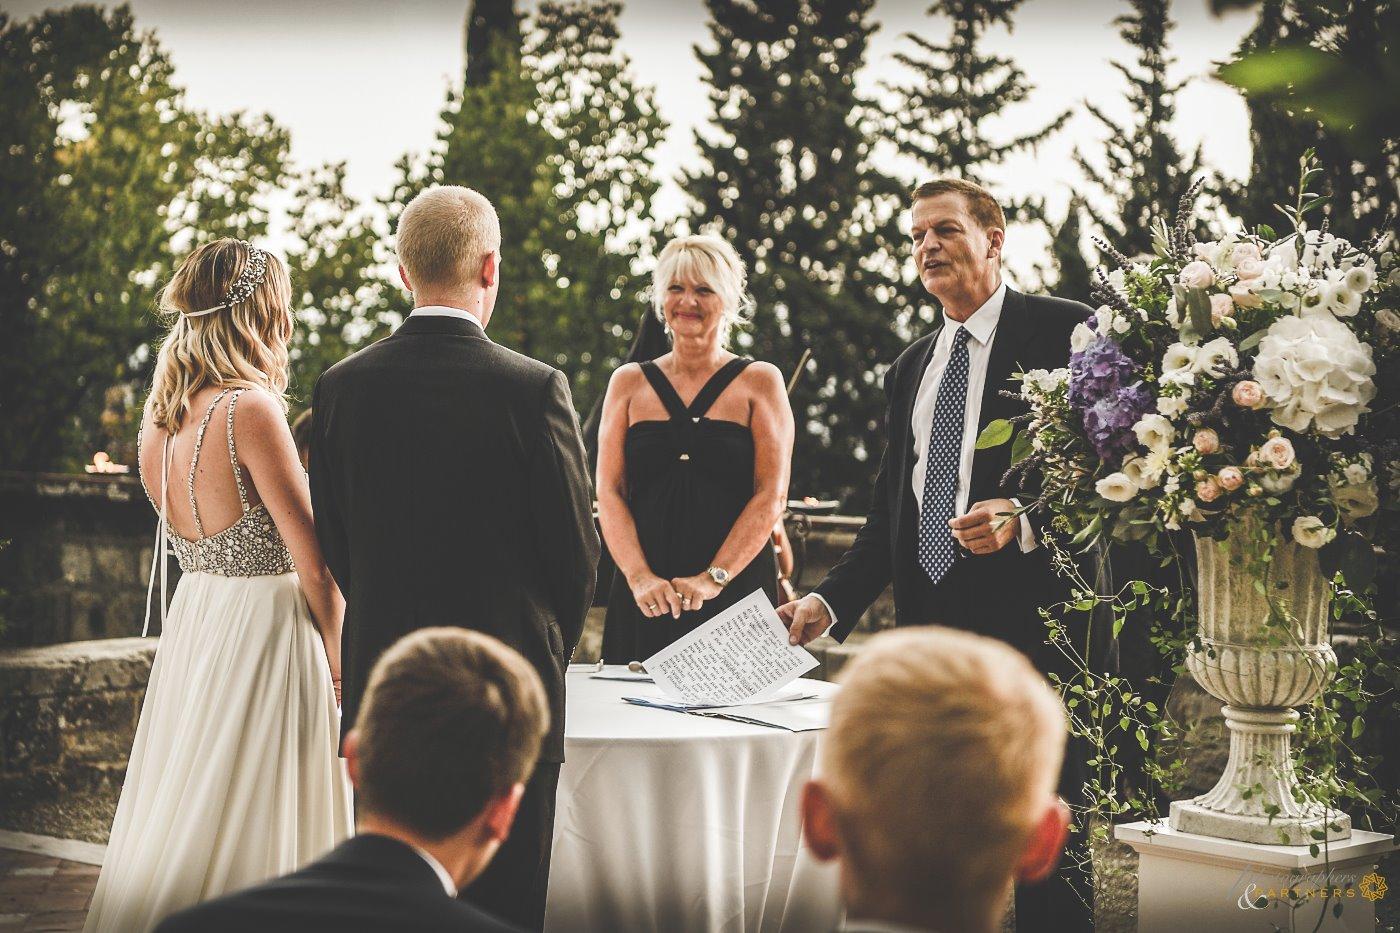 photographer_wedding_florence_09.jpg